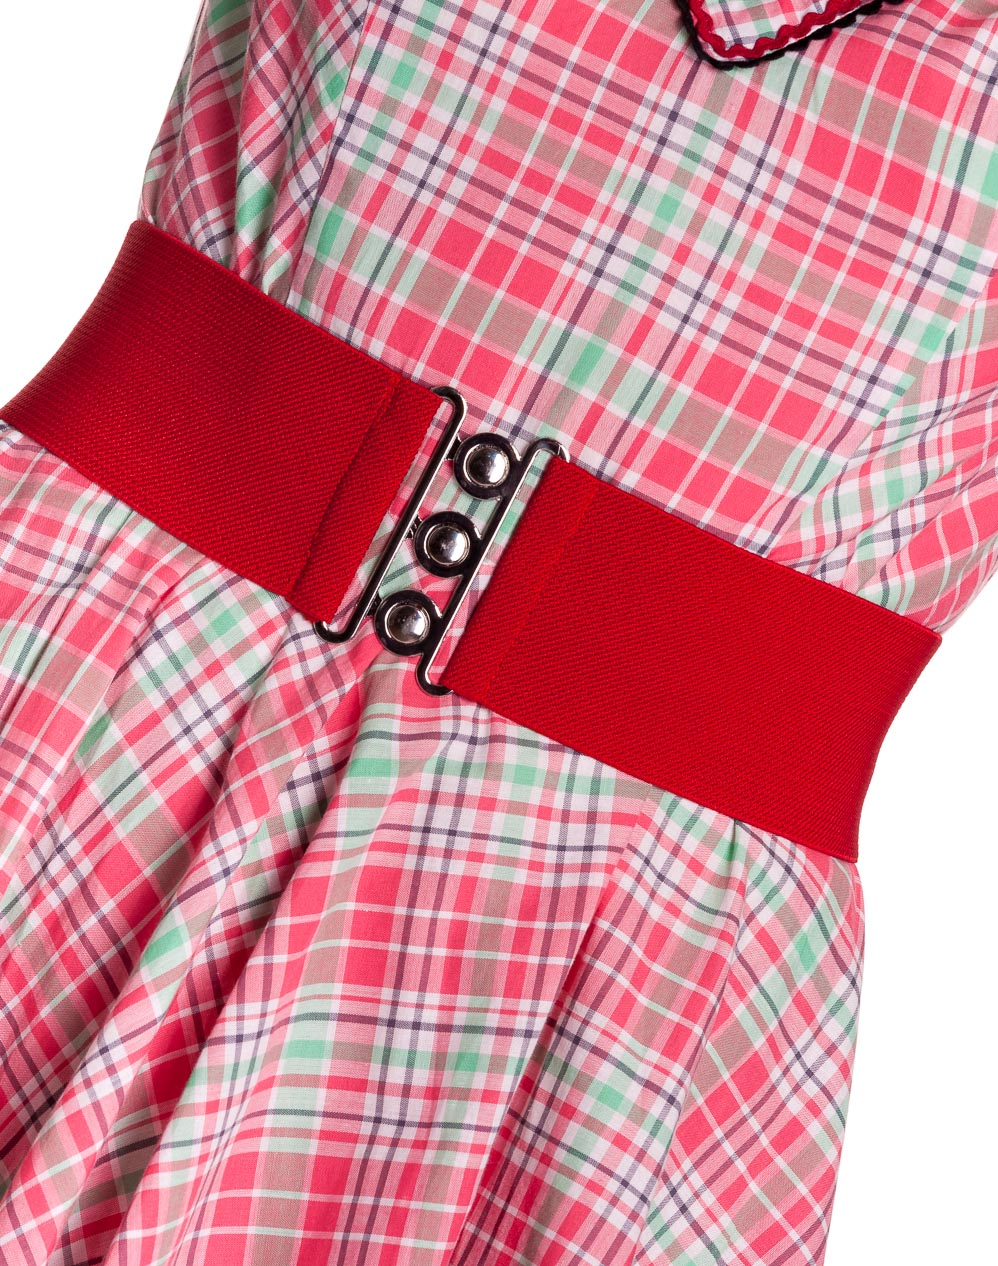 HELL BUNNY Retro 50s Waist BELT Rockabilly Elasticated Burgundy Red All Sizes